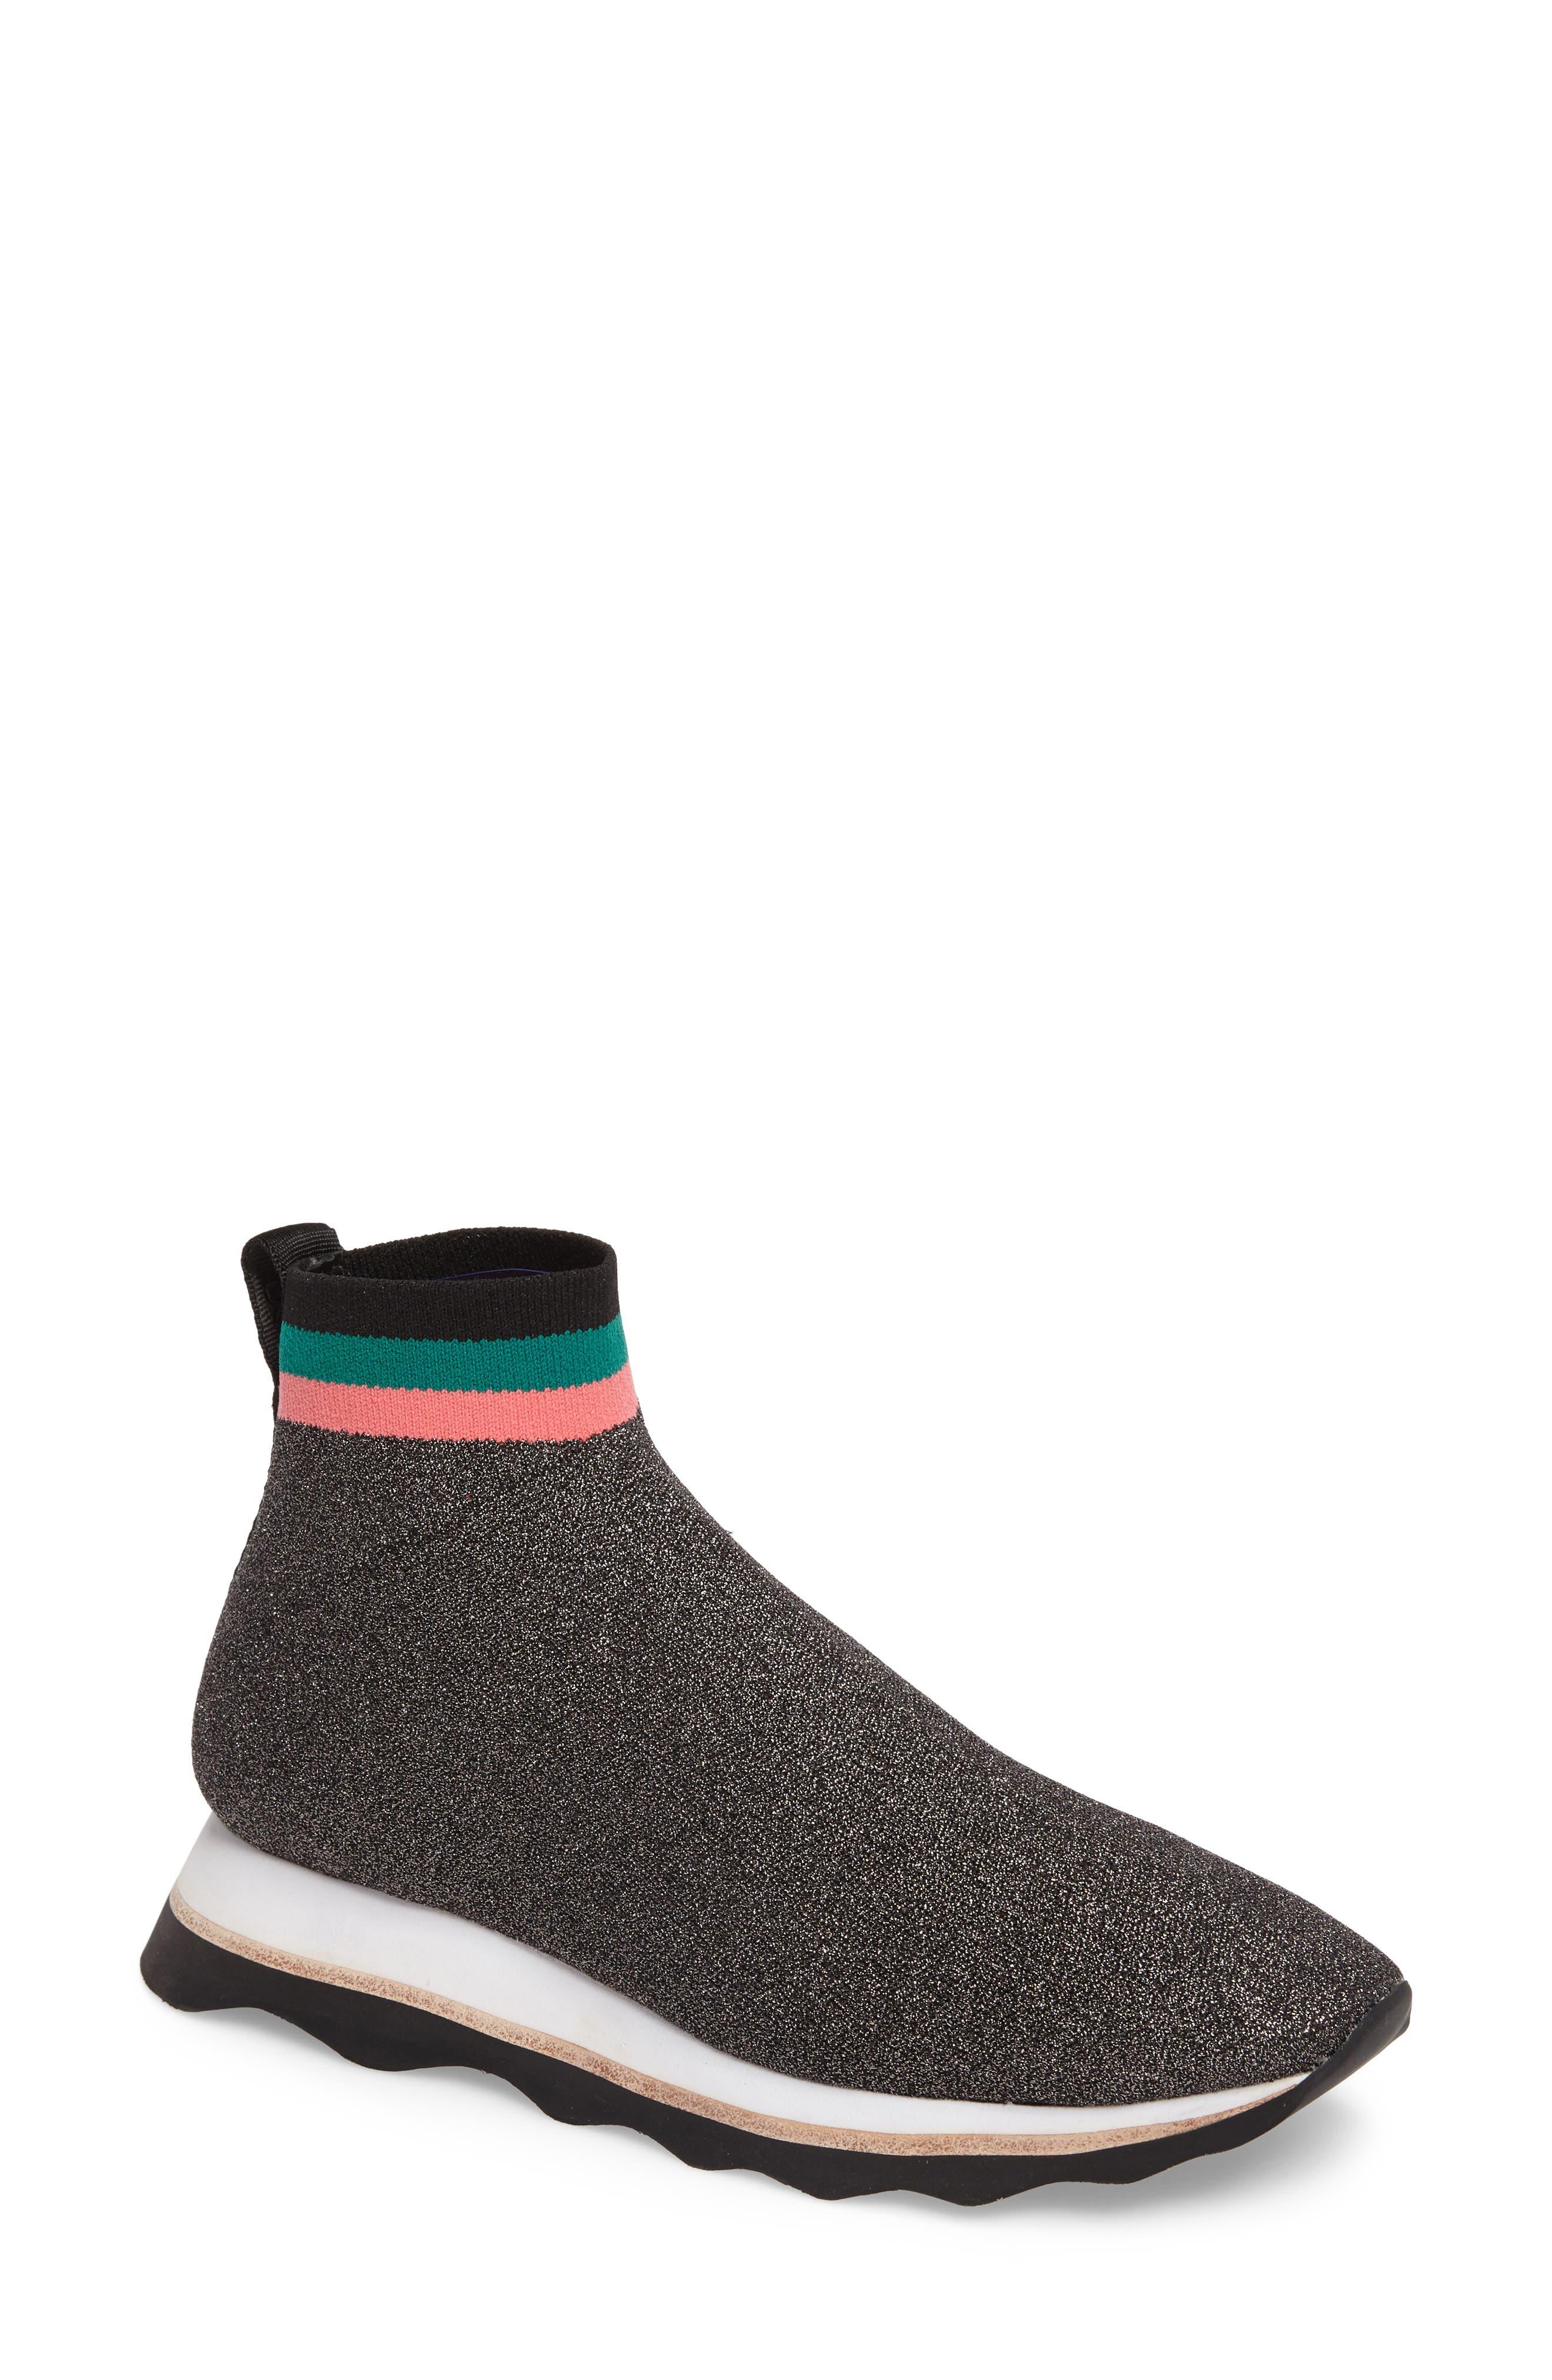 Scout Sock Sneaker,                             Main thumbnail 1, color,                             002